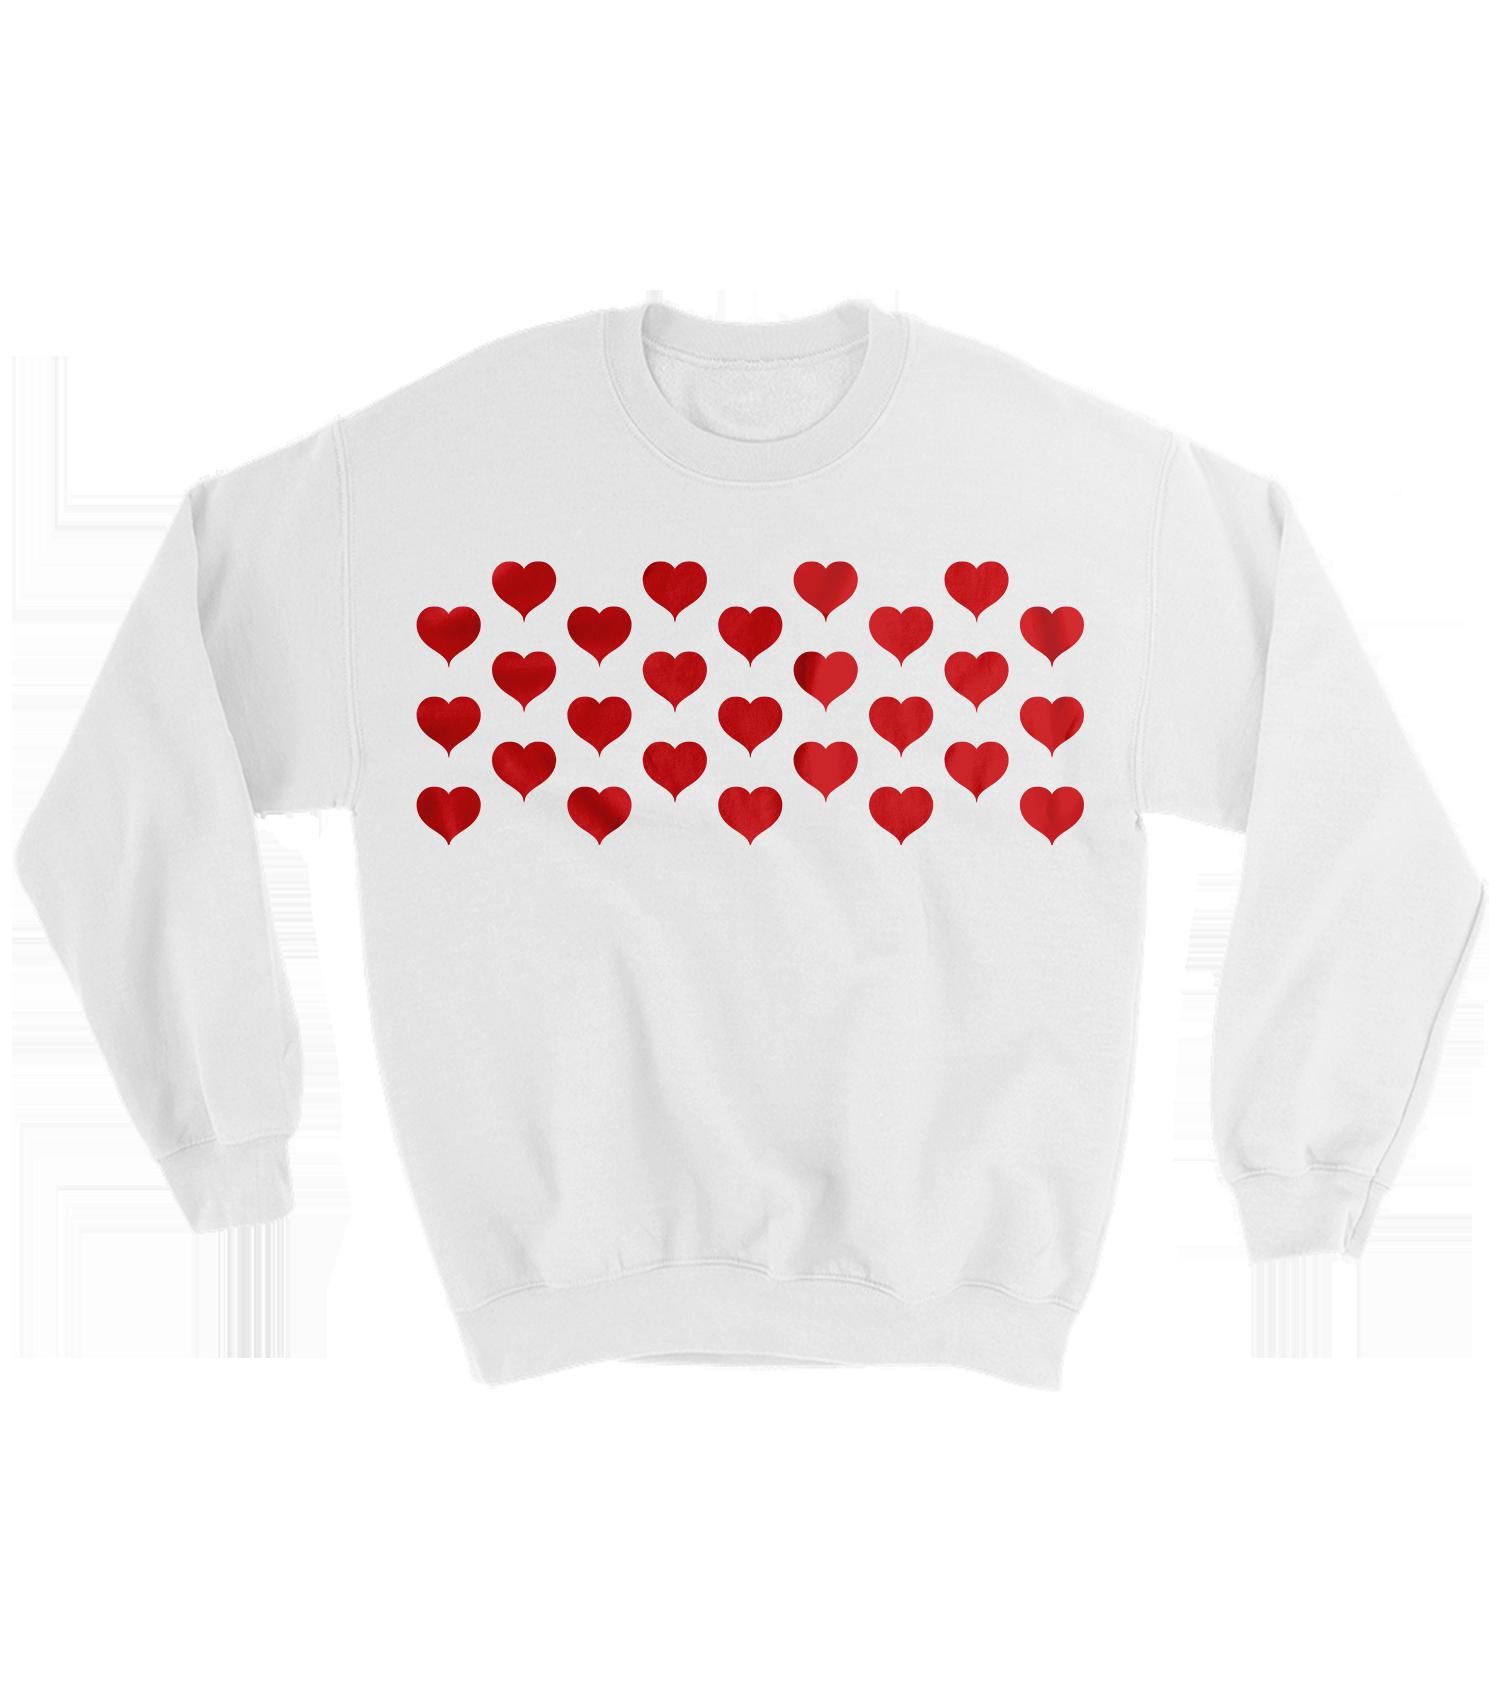 sweatshirt2.png